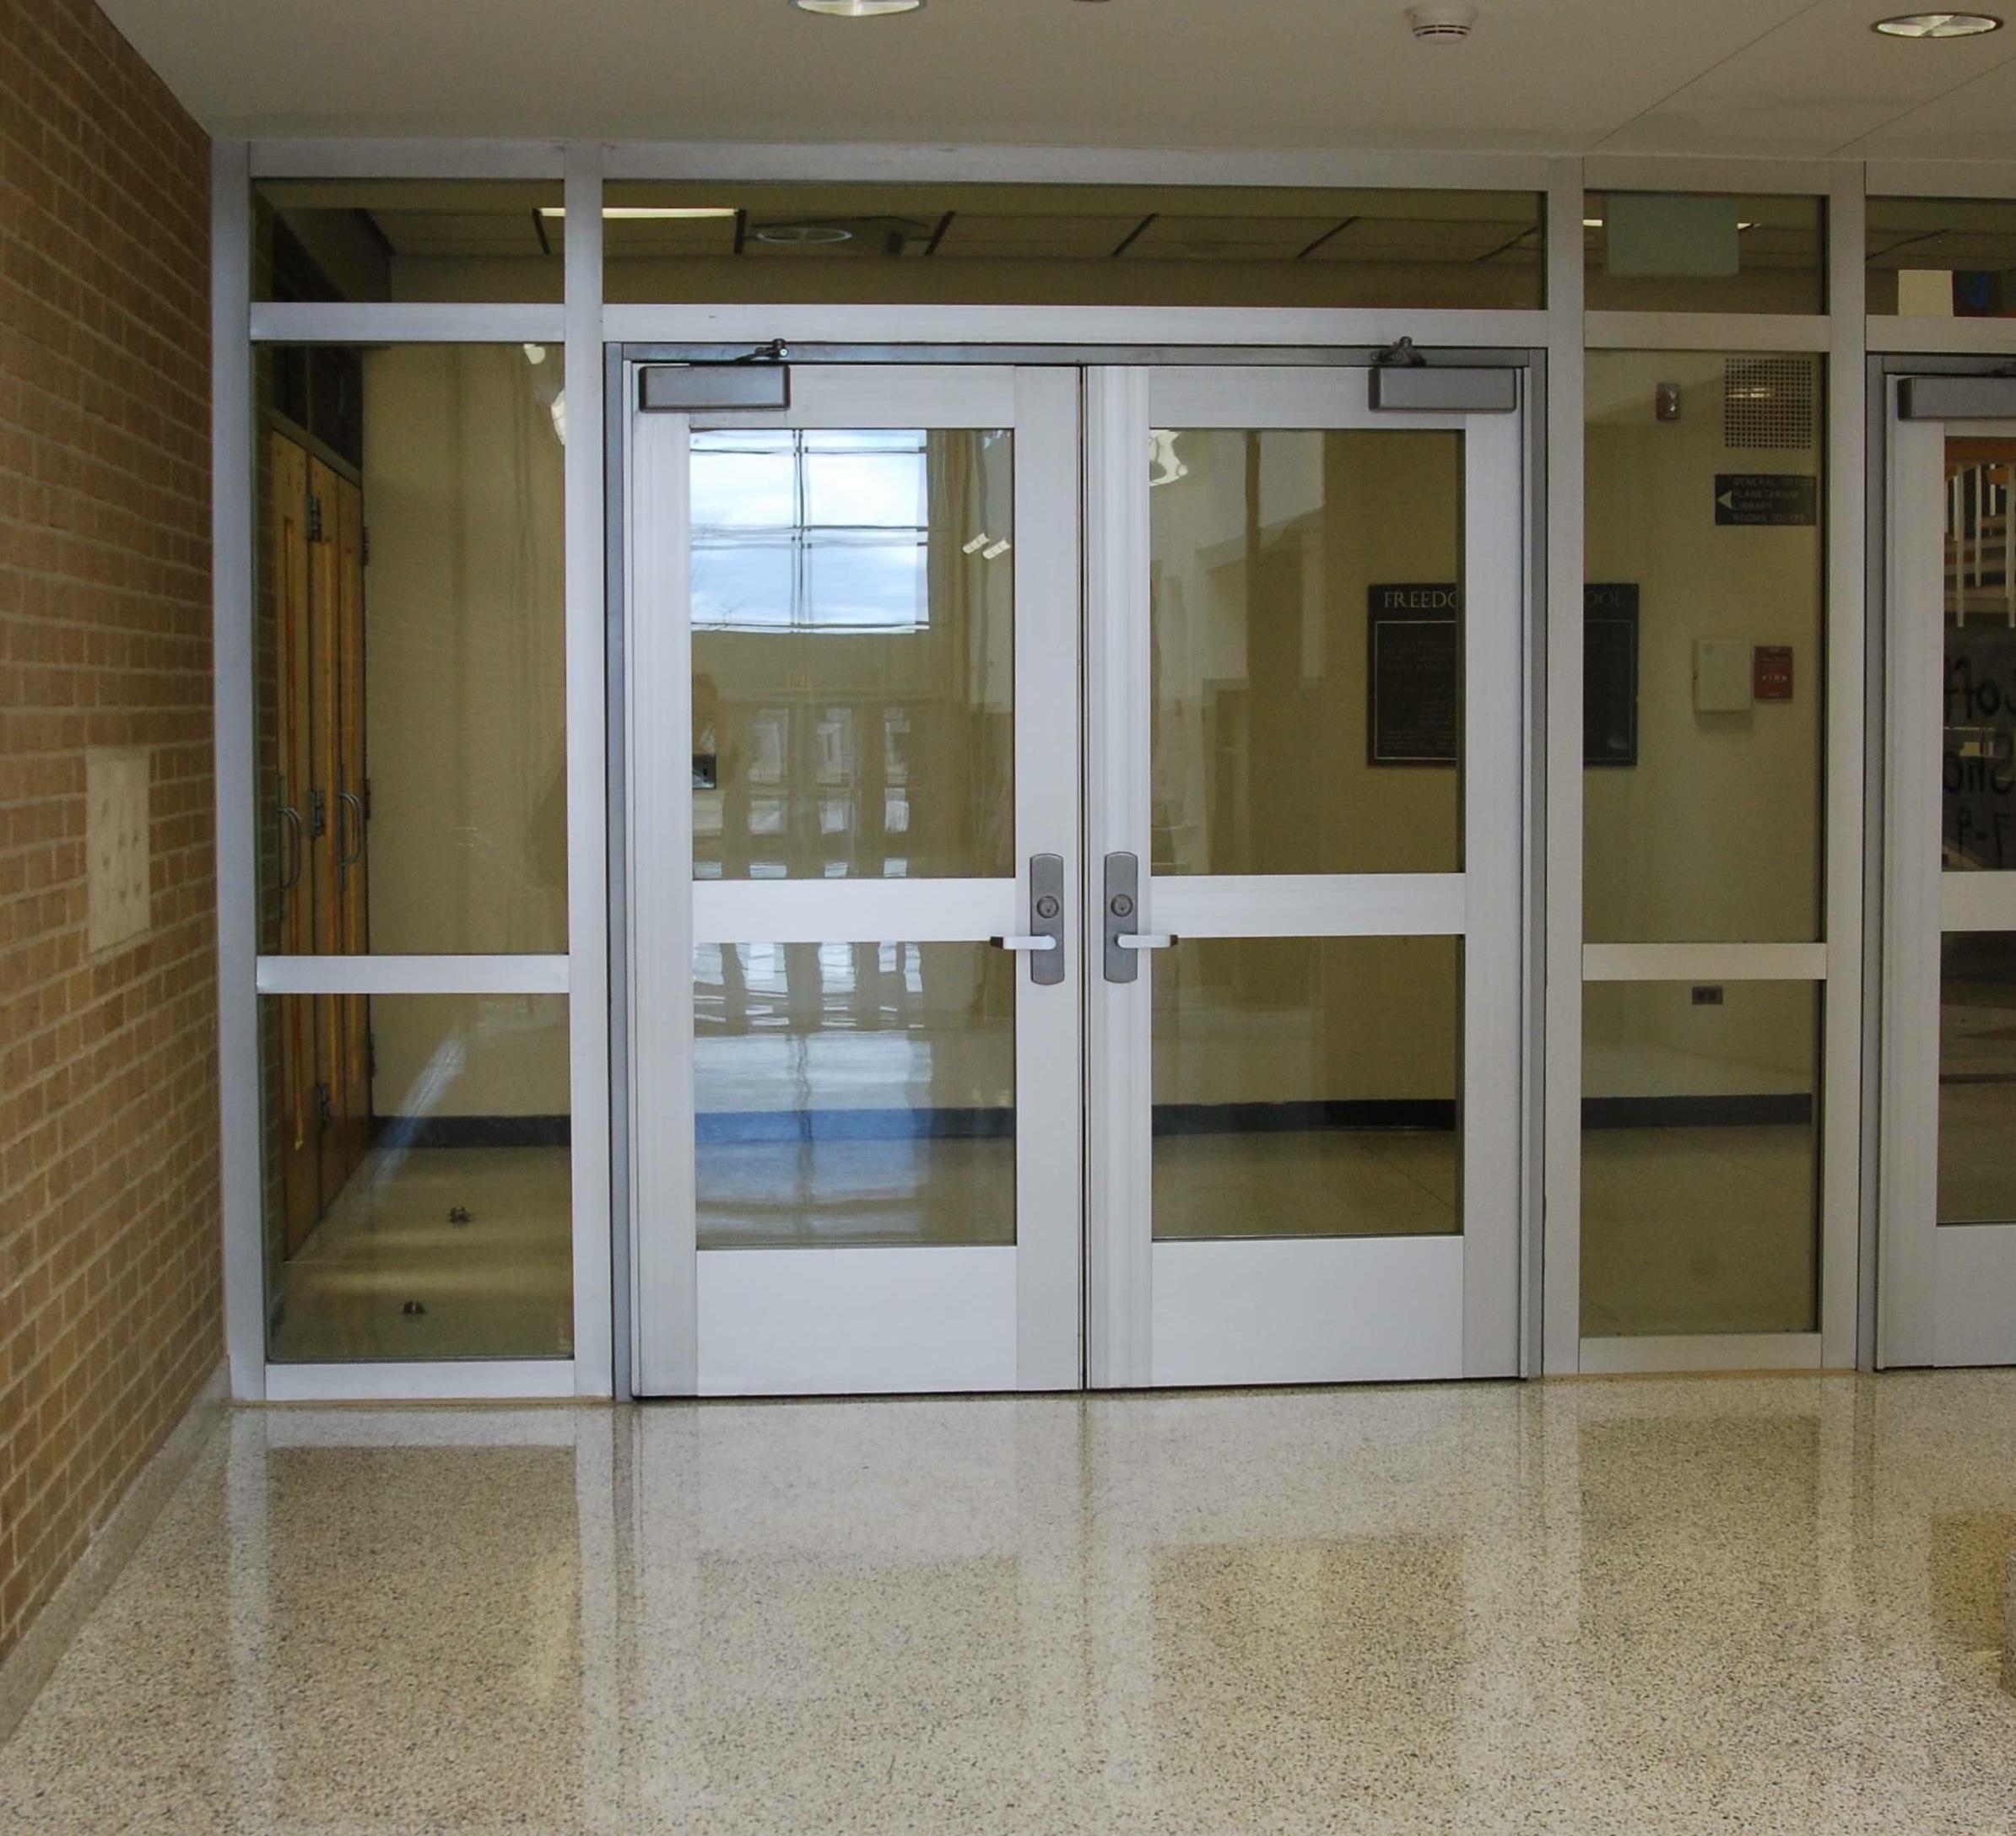 Freedom High School Bethlehem Pennsylvania & Gallery: Fire rated glass \u0026 framing | Safe Glass For Schools